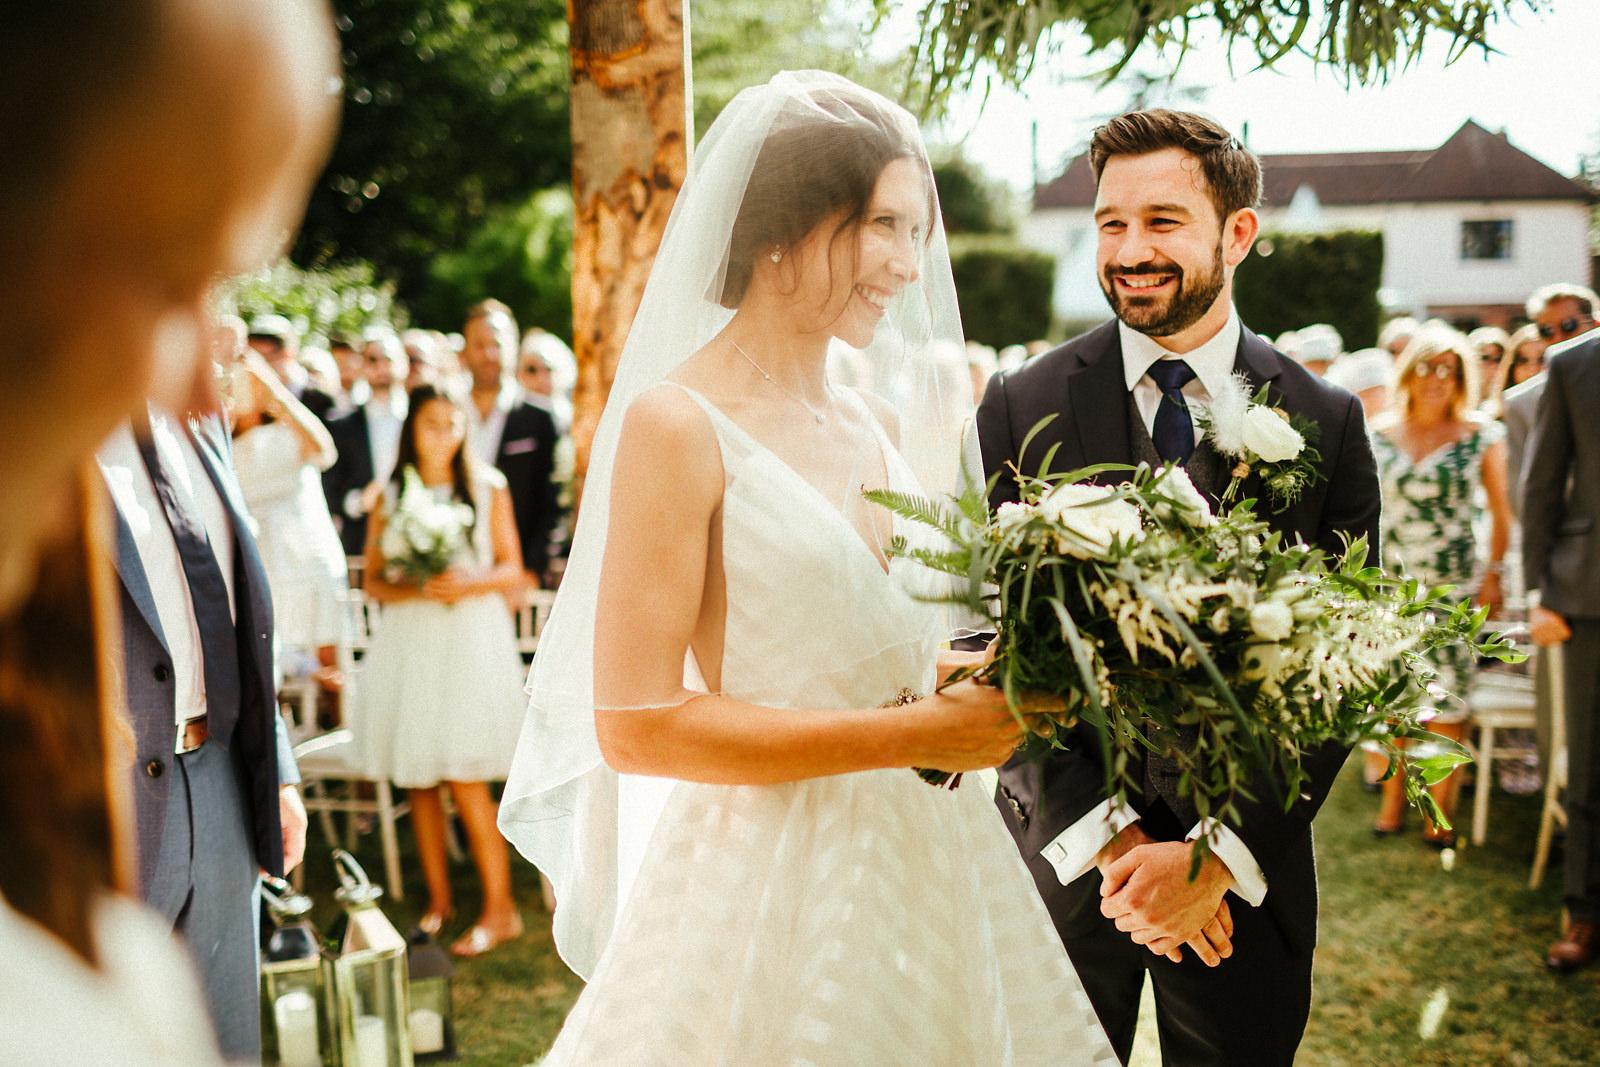 Arrival of jewish bride in August wedding